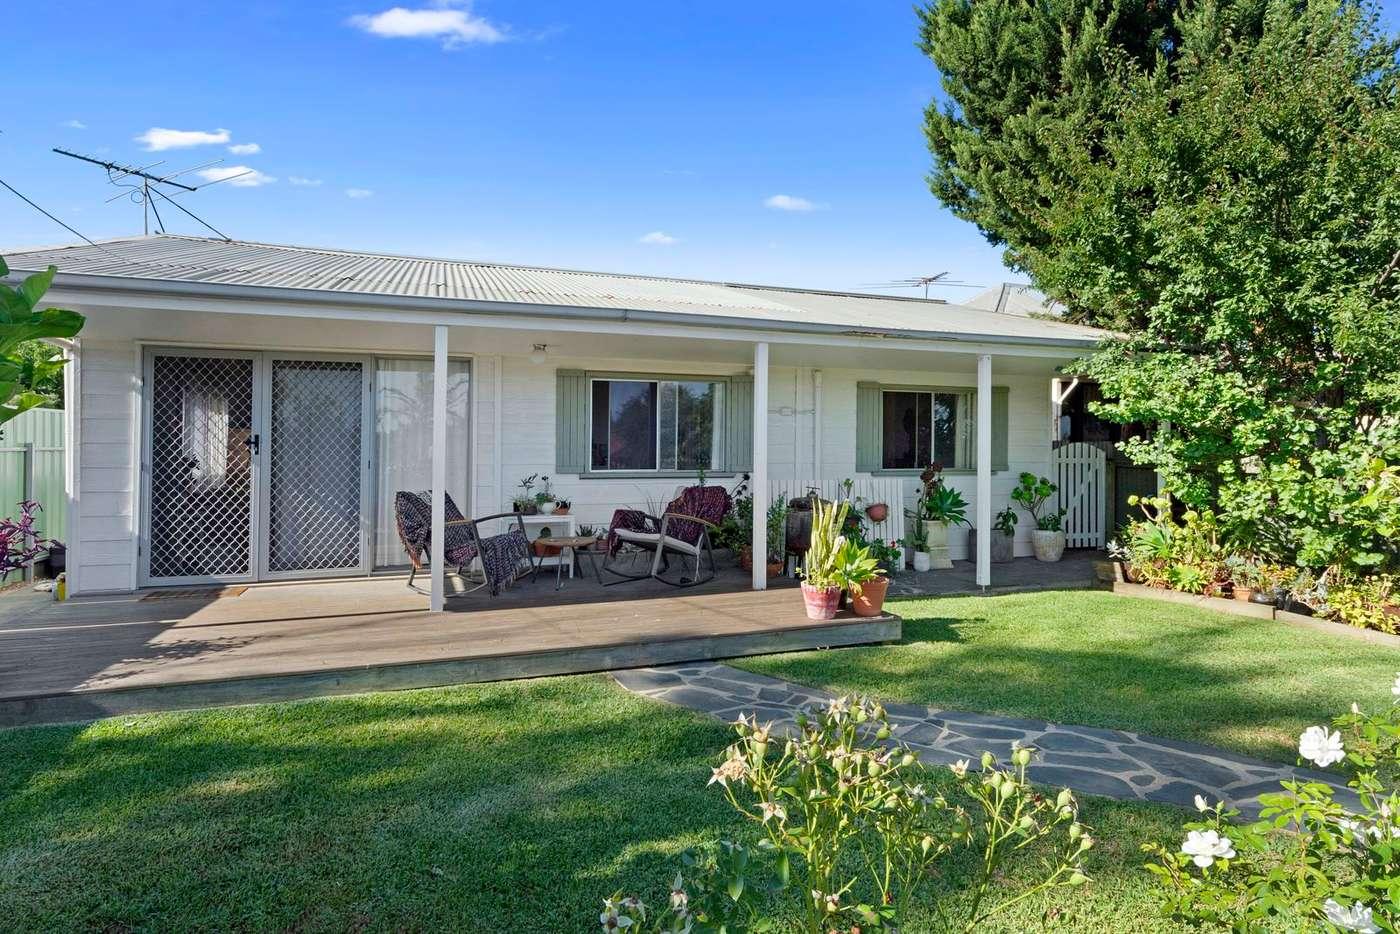 Main view of Homely house listing, 70 Fenton Street, Christies Beach SA 5165